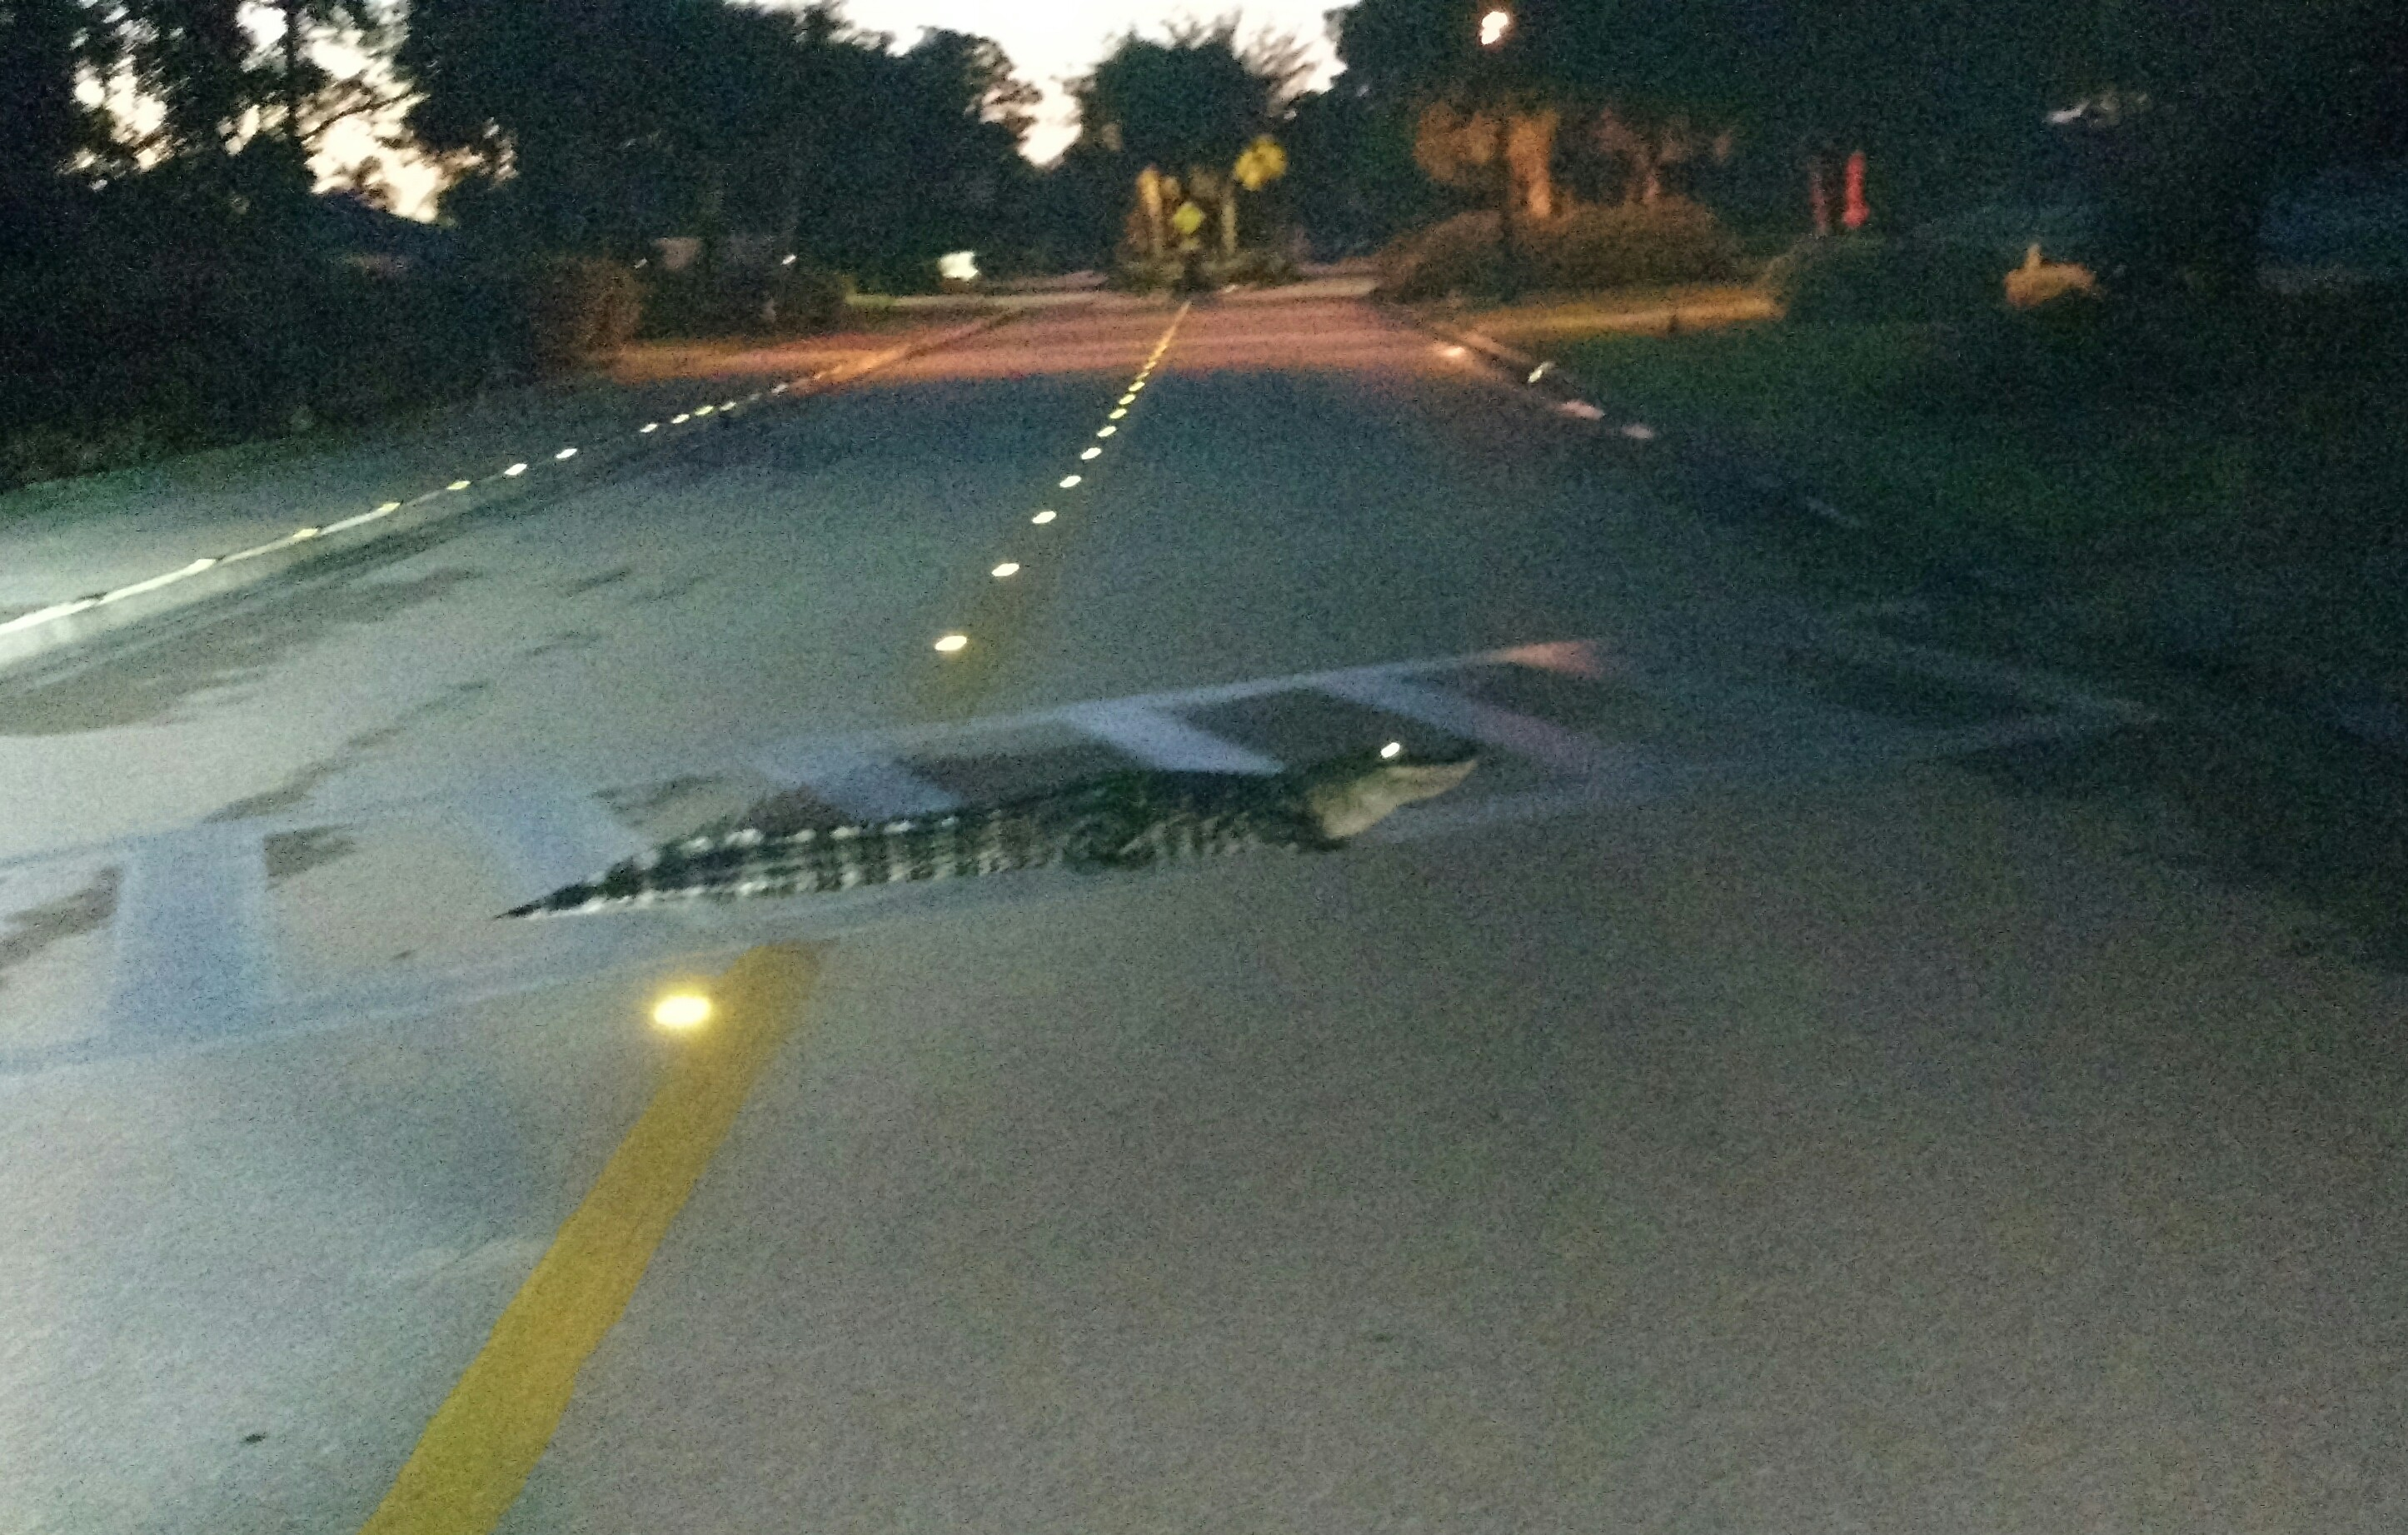 Name:  gator sidewalk.jpg Views: 189 Size:  1.14 MB